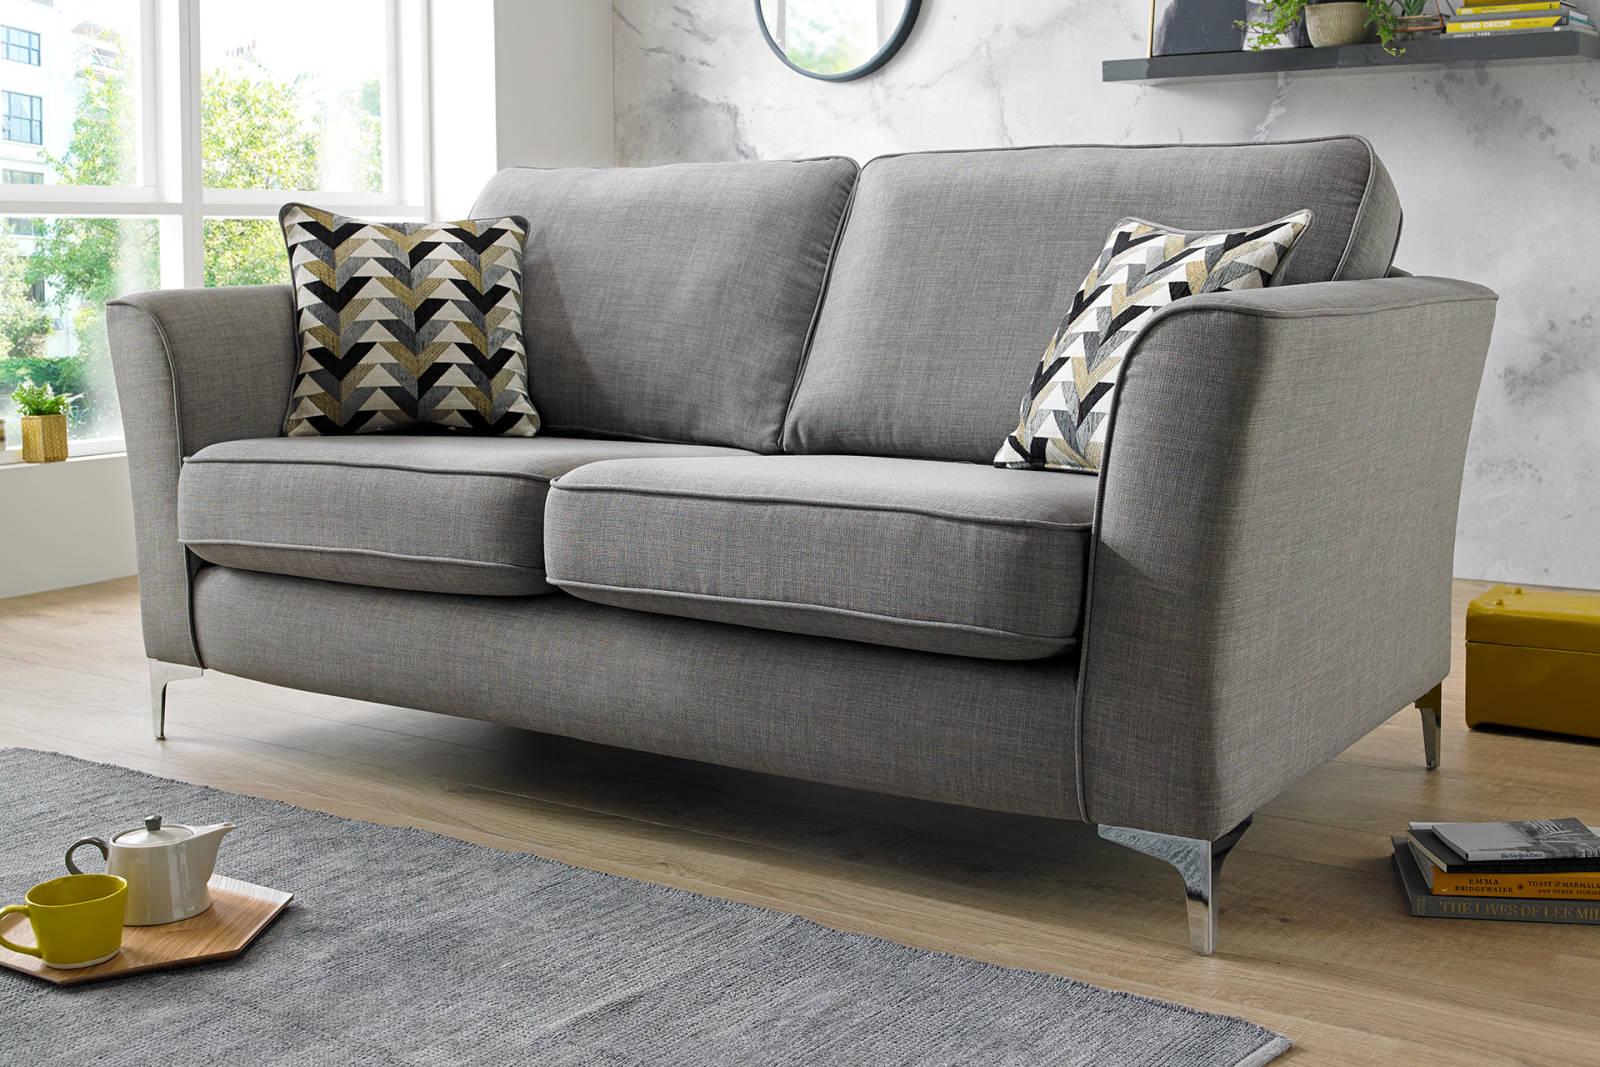 Sofas Leather Wonderful Home Design